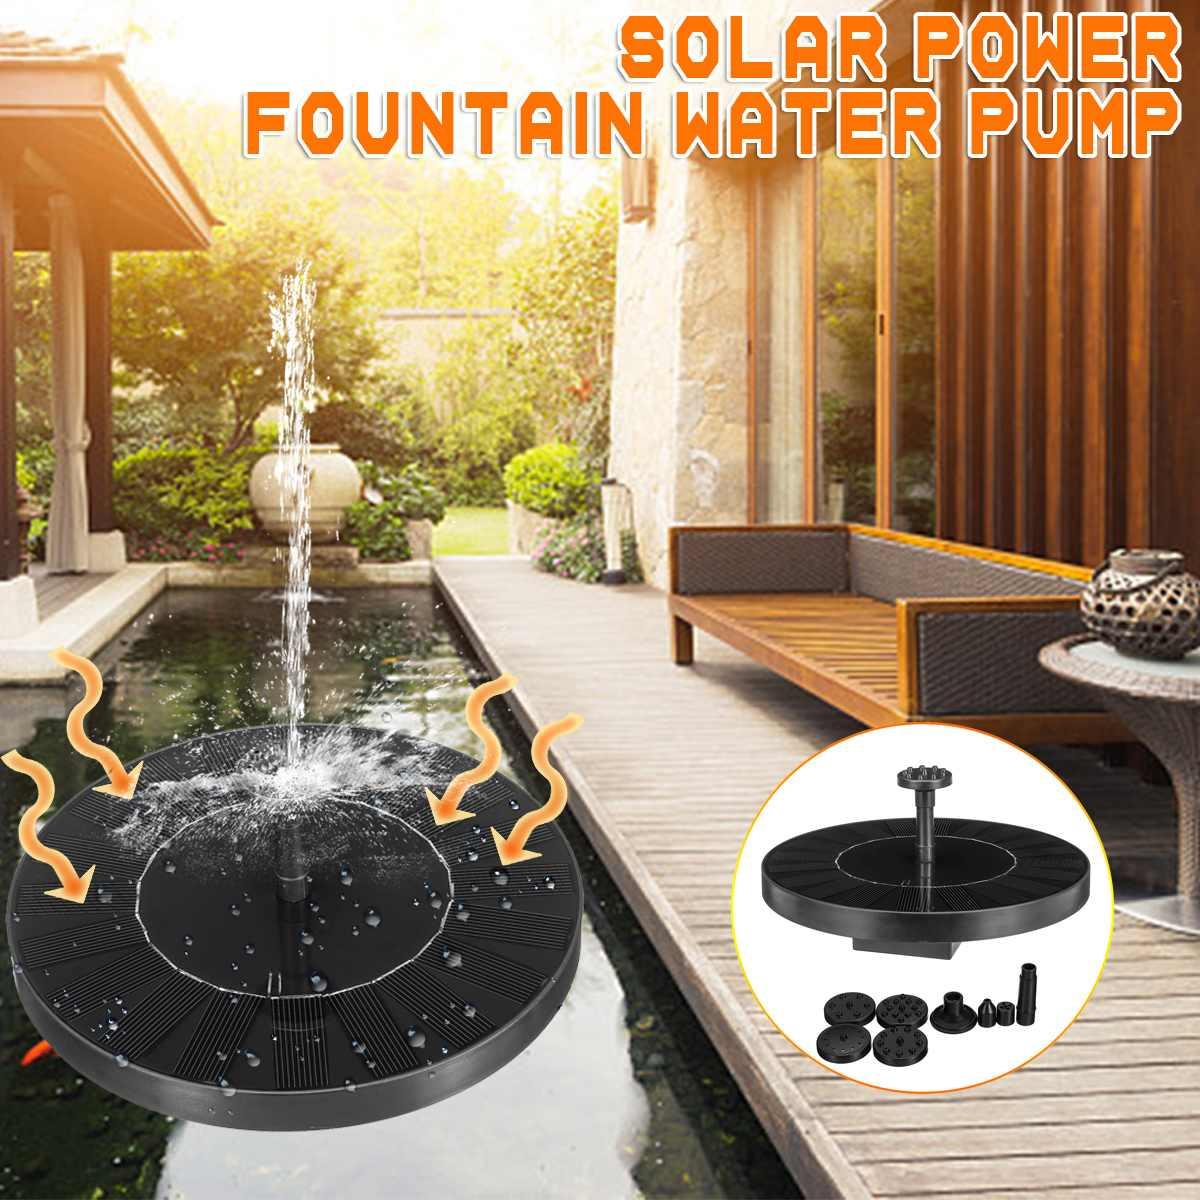 AUGIENB Solar Water Floating Pump Fountain 1000mAh  Pool Solar Garden Fountain Artificial Outdoor Fountain Solar Pump Kit Set